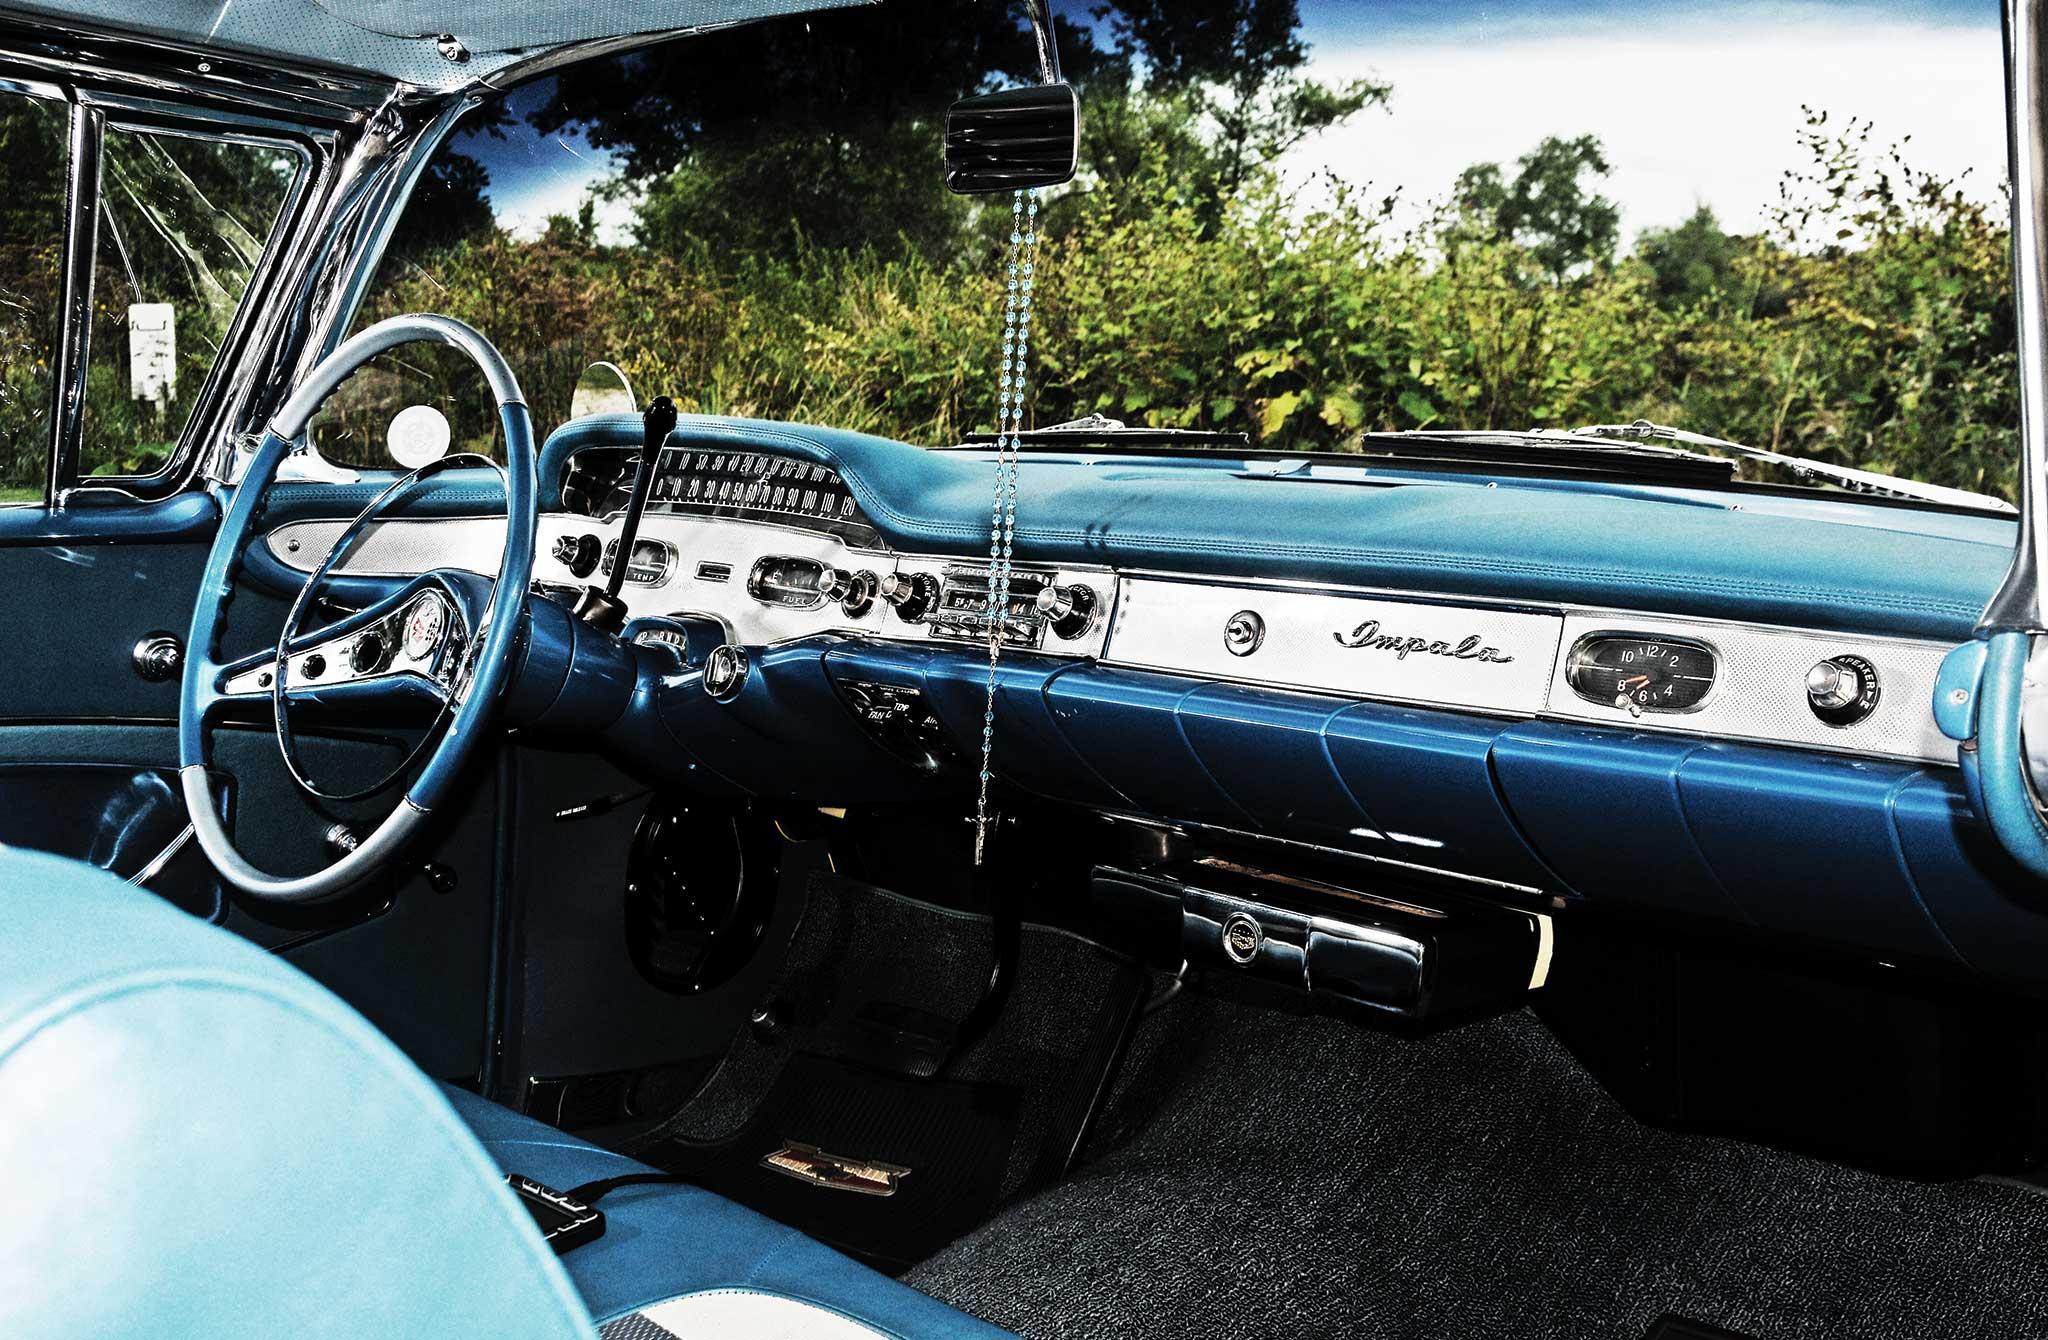 1958 Chevrolet Impala - Highway to Heaven - Lowrider